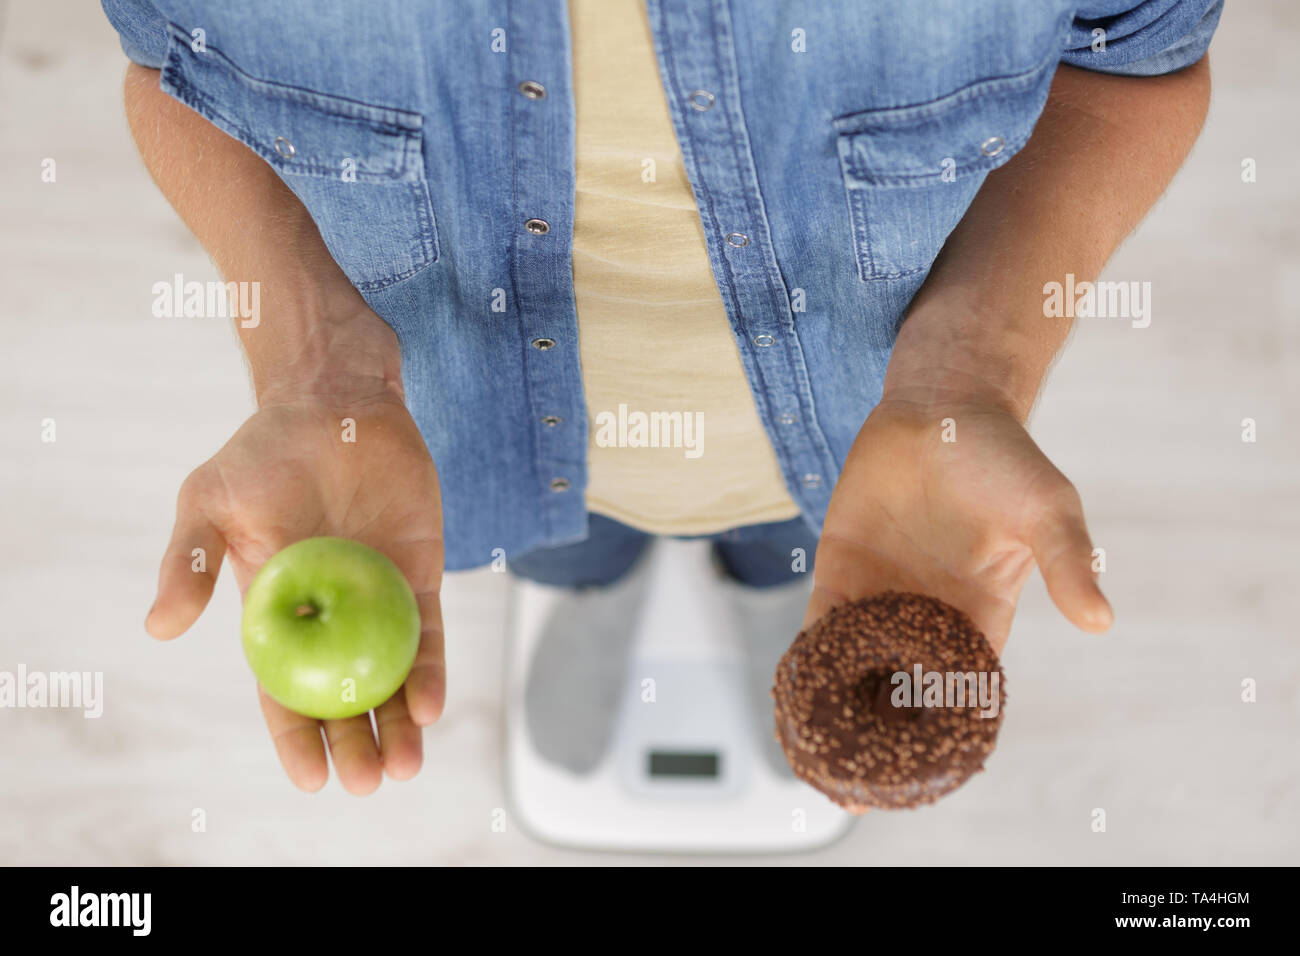 choosing between donut and apple - Stock Image